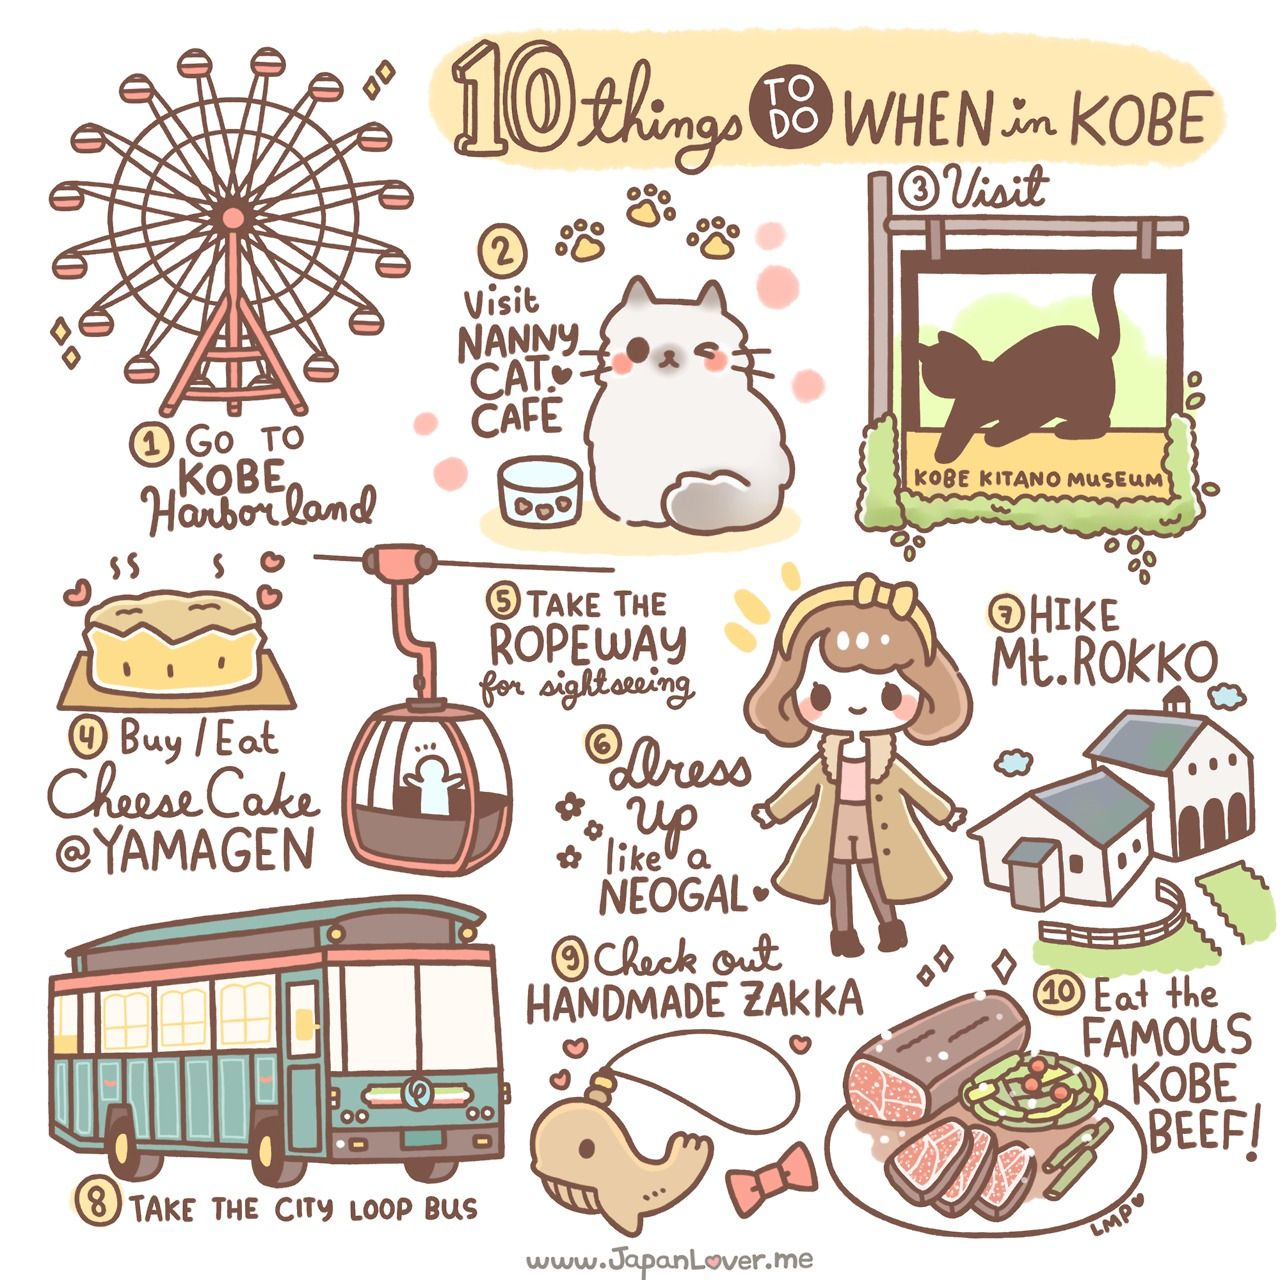 Japan Lover Me: things to do in Kobe